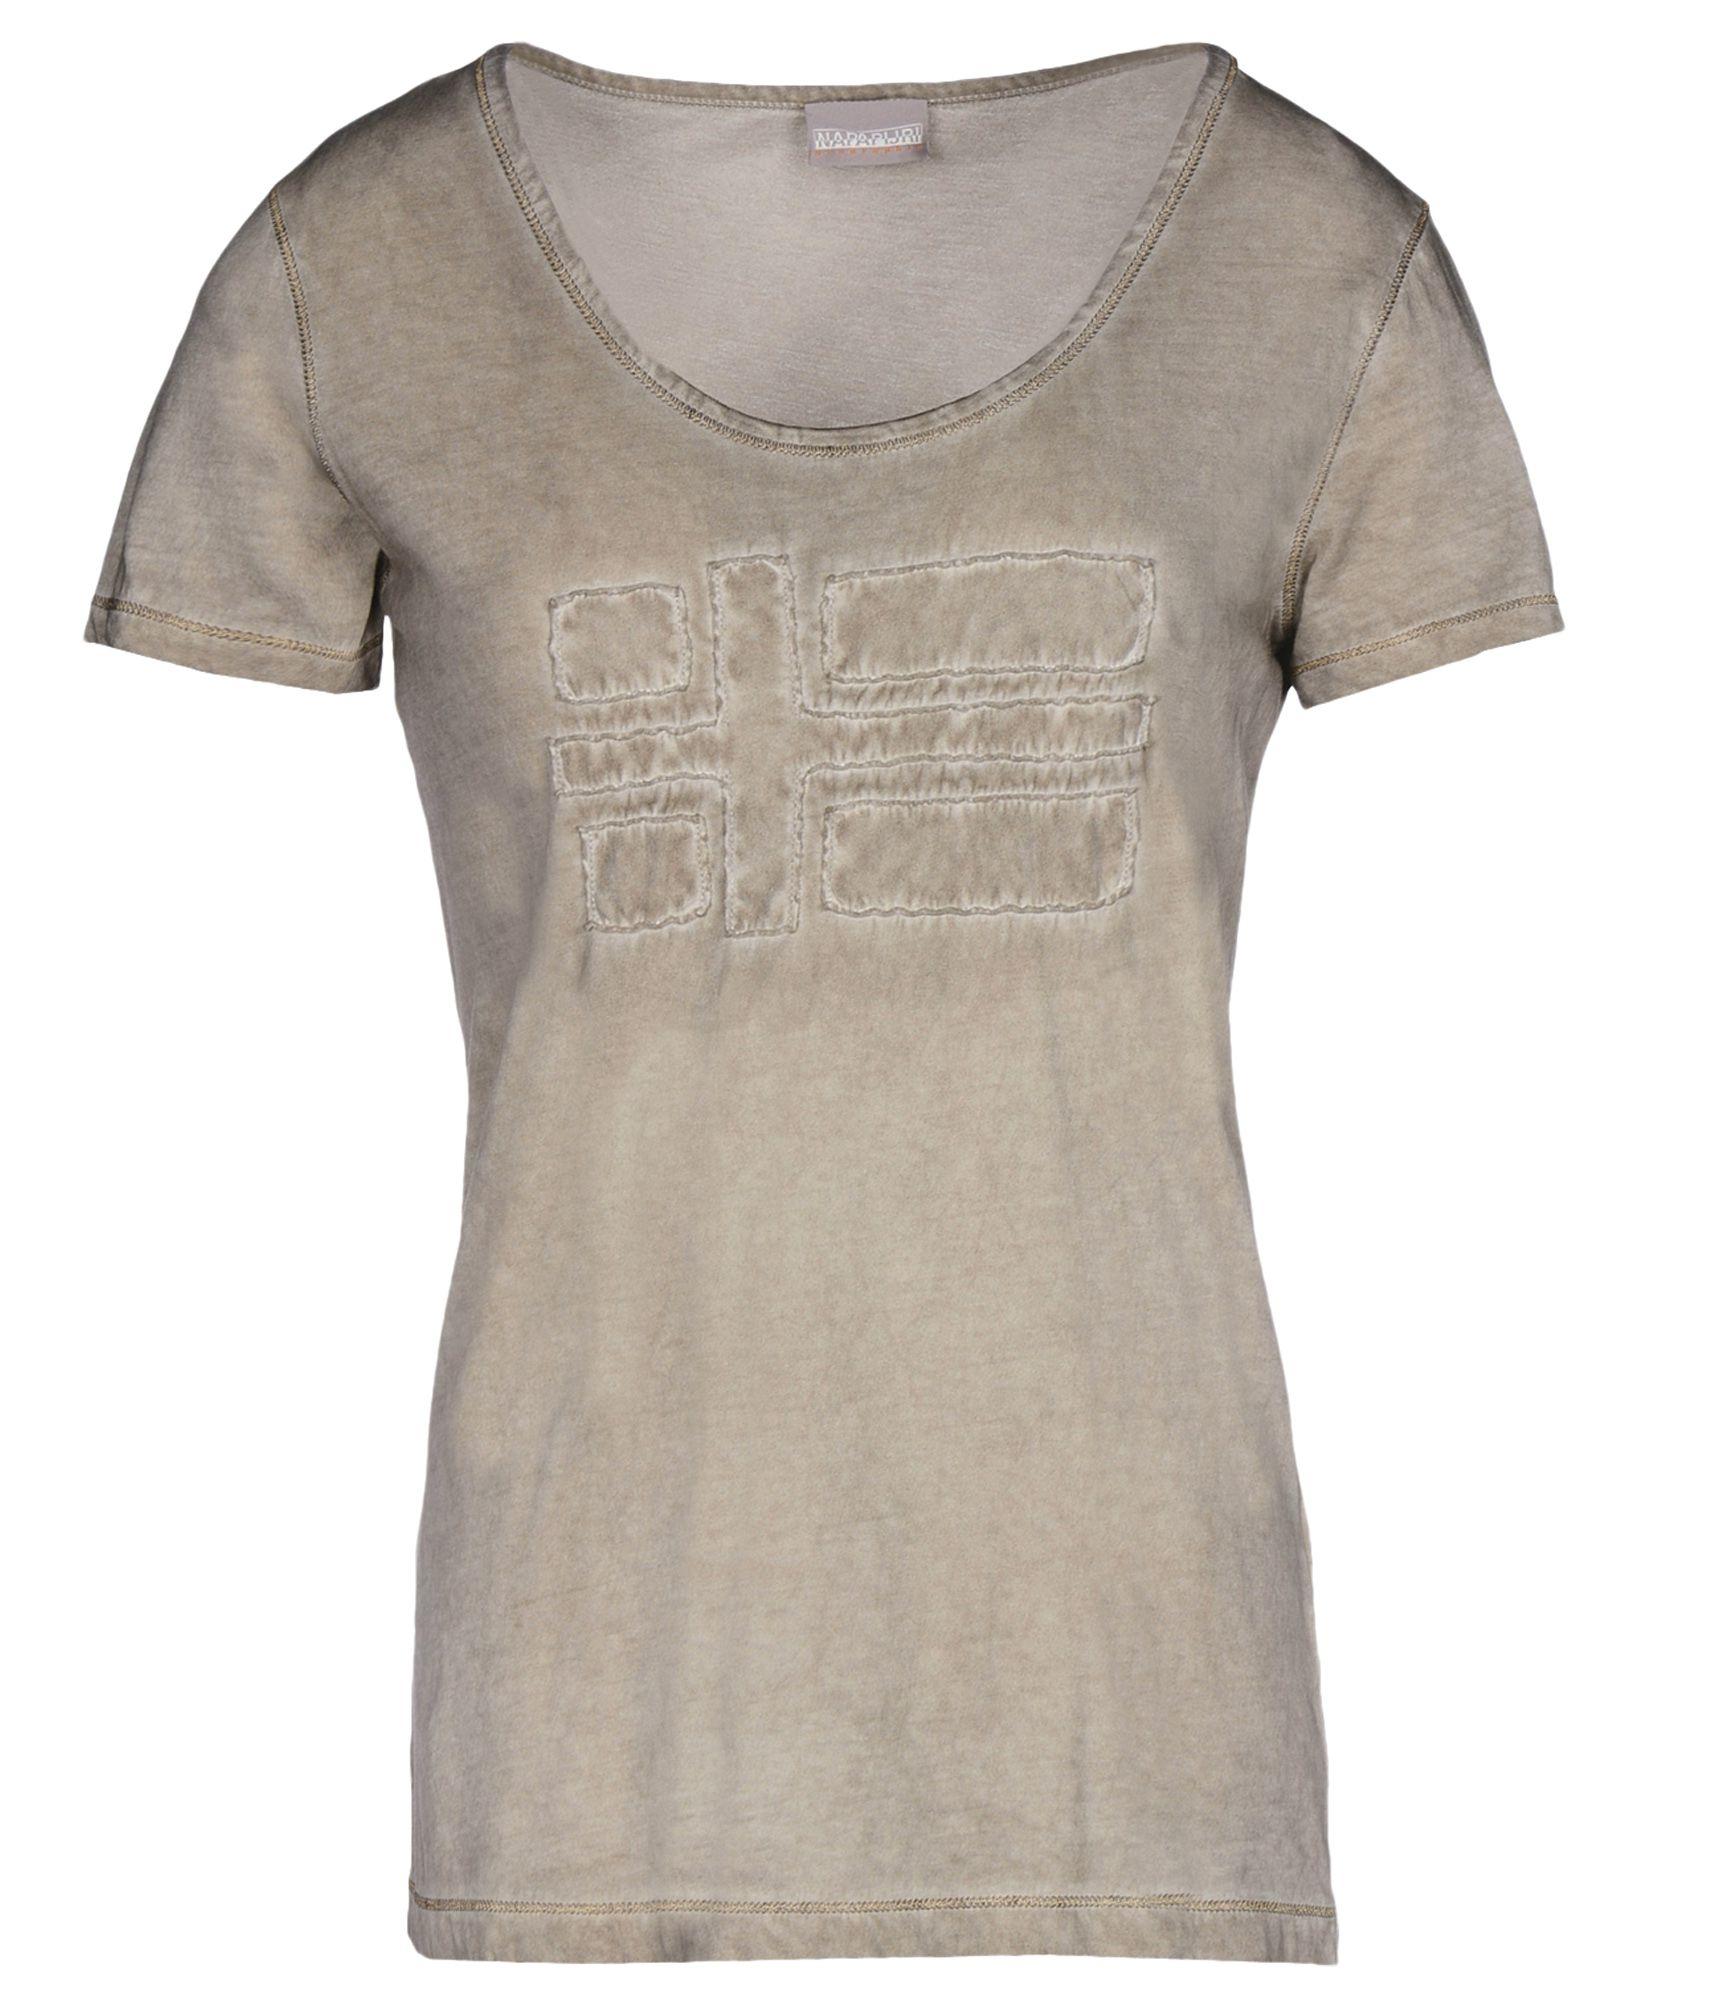 napapijri short sleeve t shirt in natural lyst. Black Bedroom Furniture Sets. Home Design Ideas